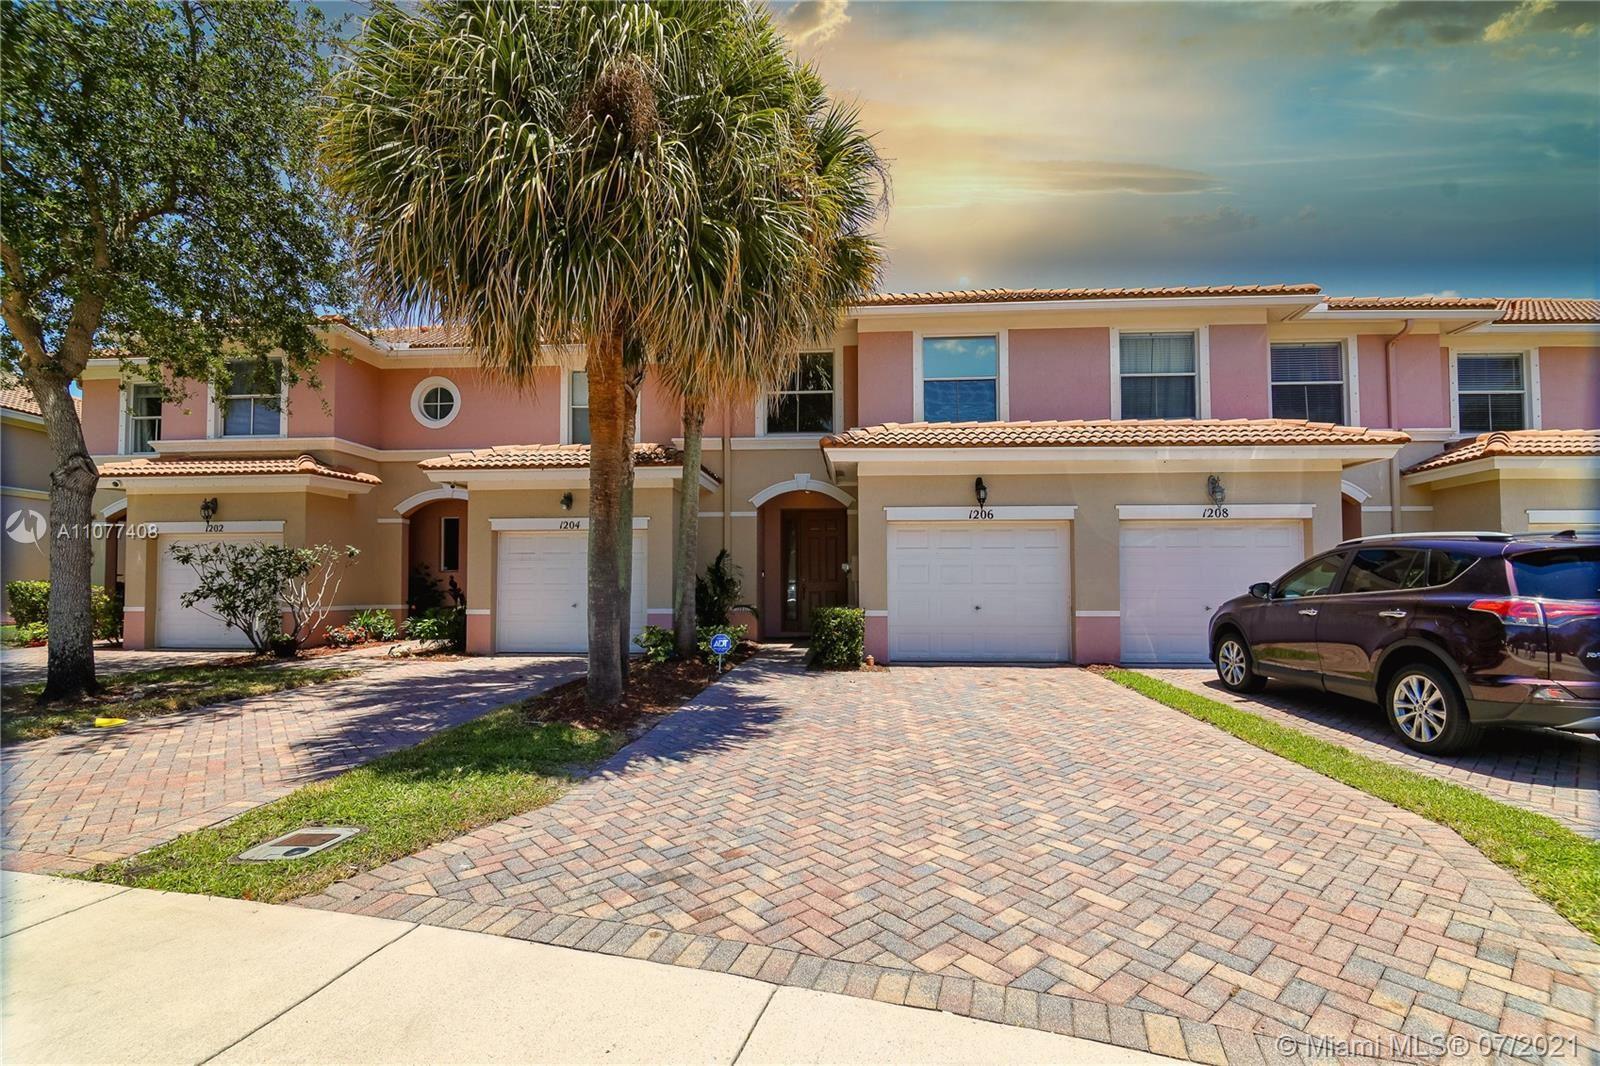 1206 Seminole Palms Dr, Greenacres, FL 33463 - #: A11077408